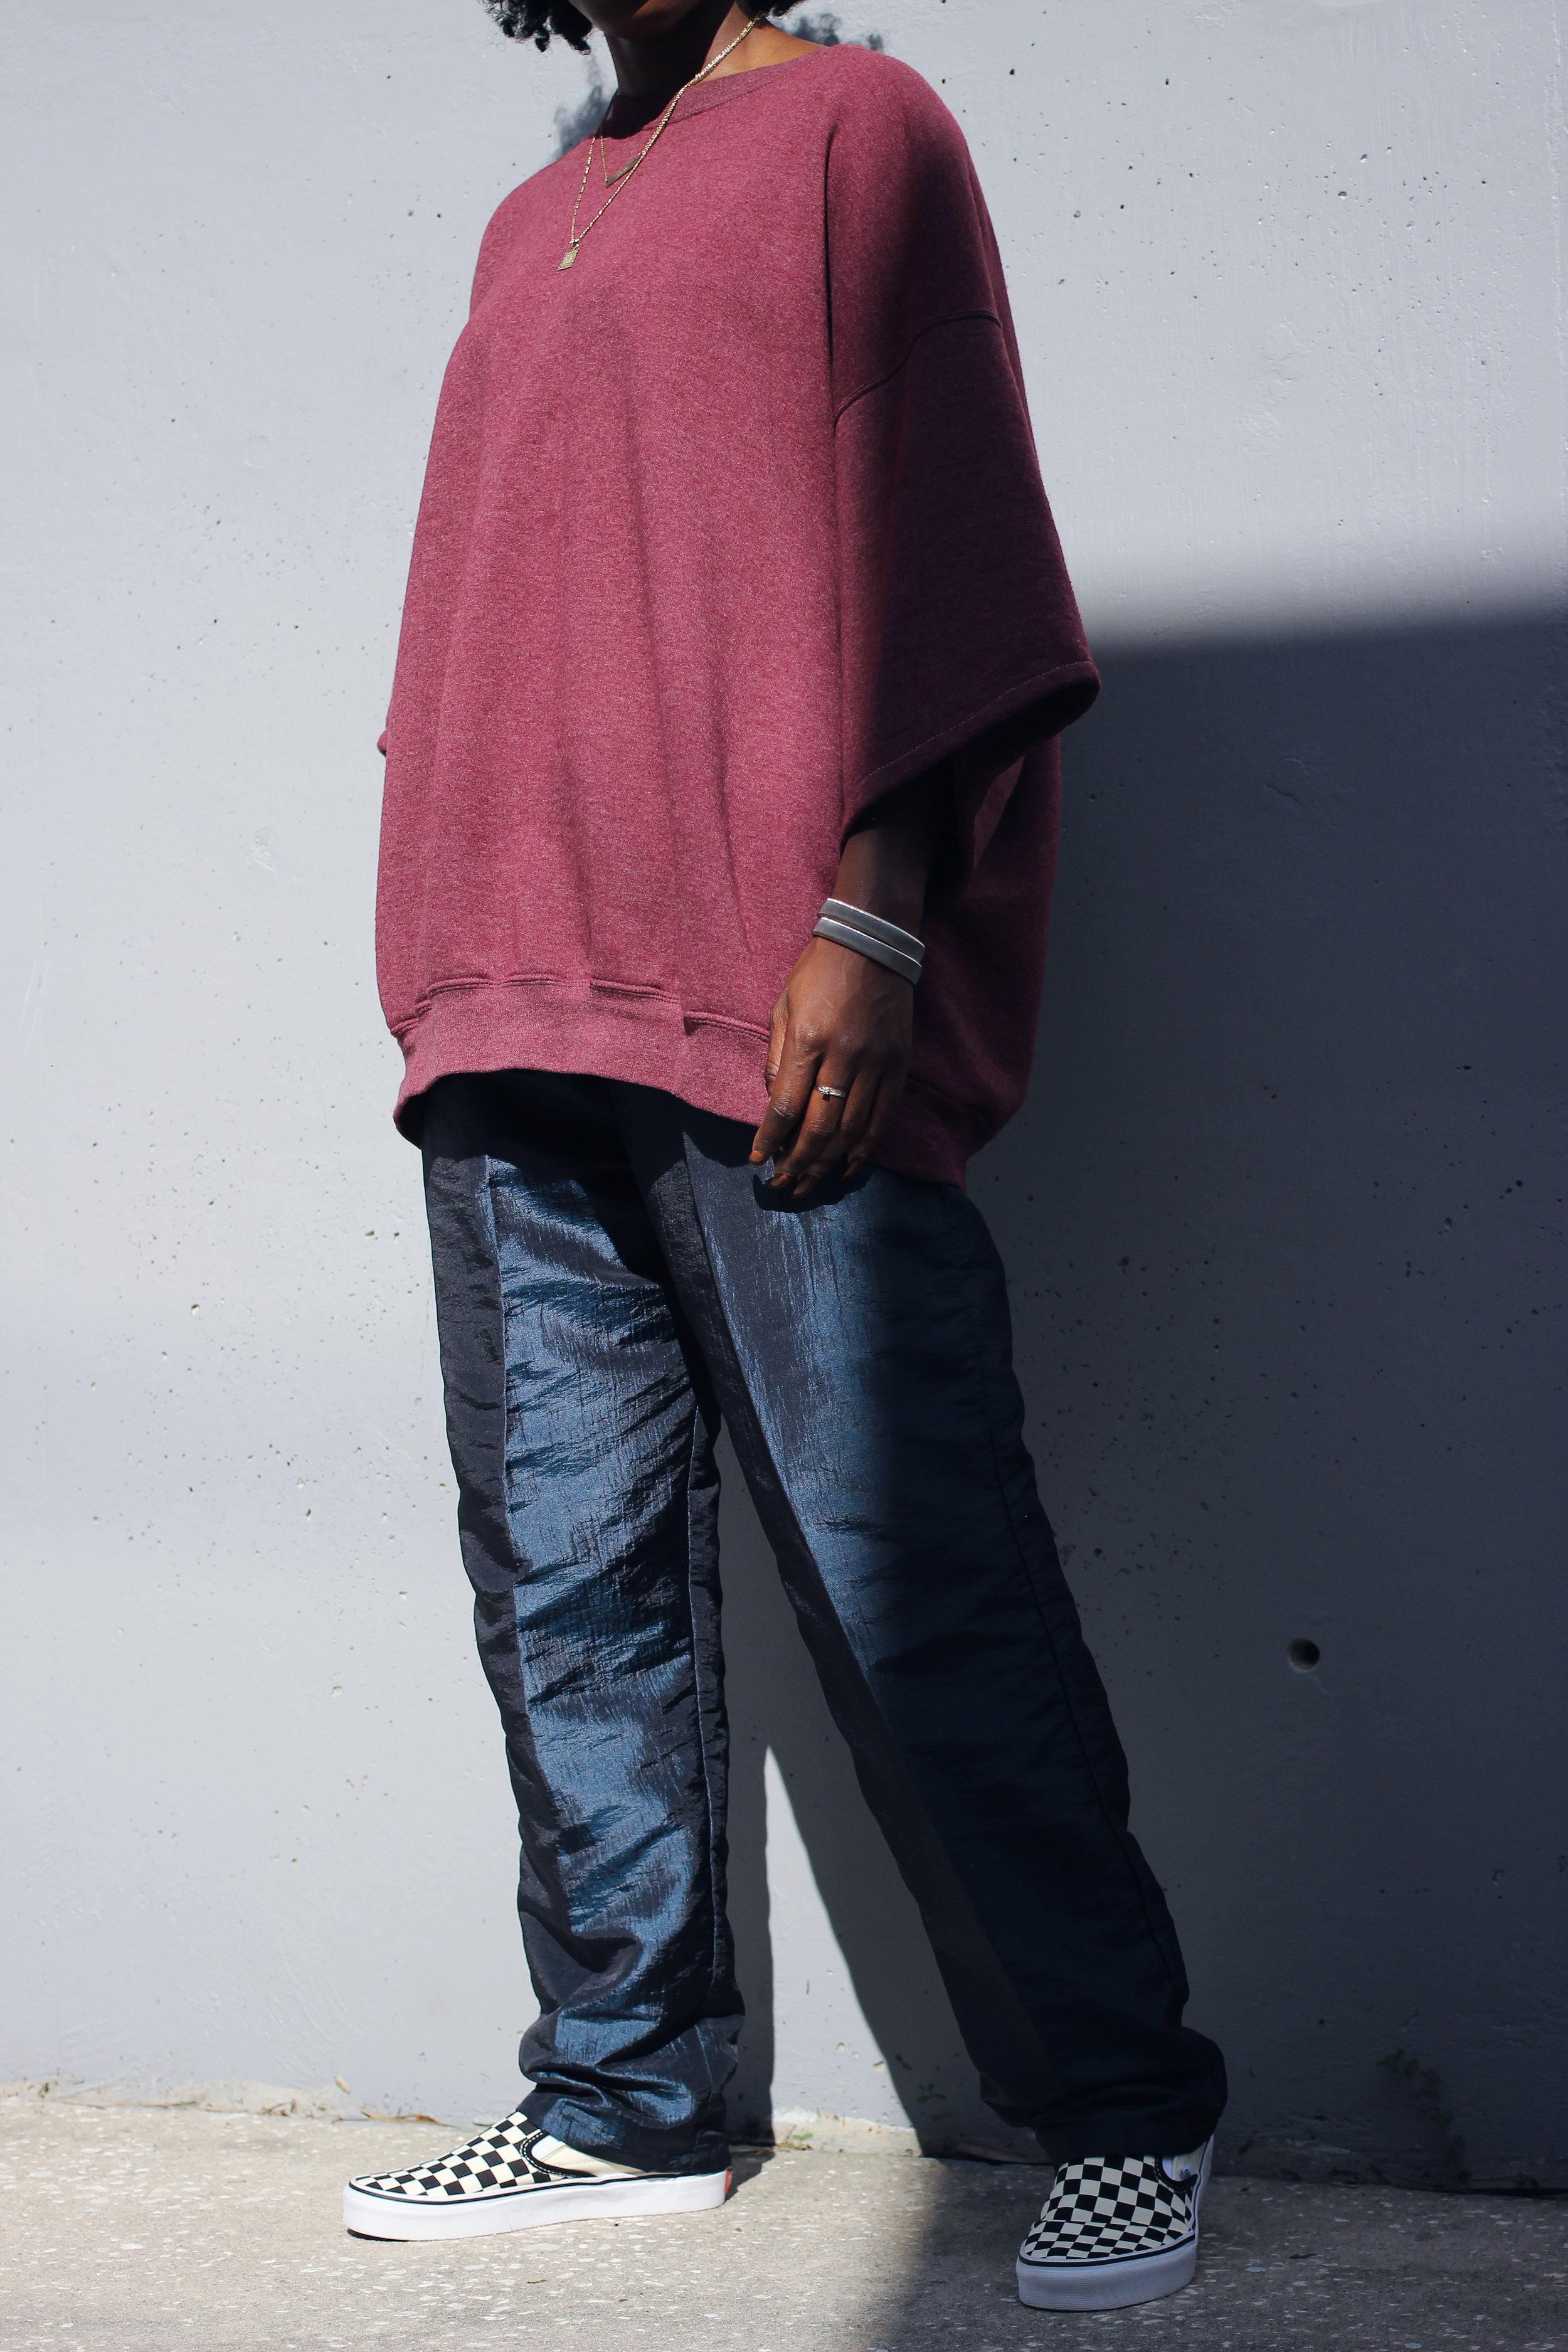 ryan petit look 1 baggy clothes.jpg